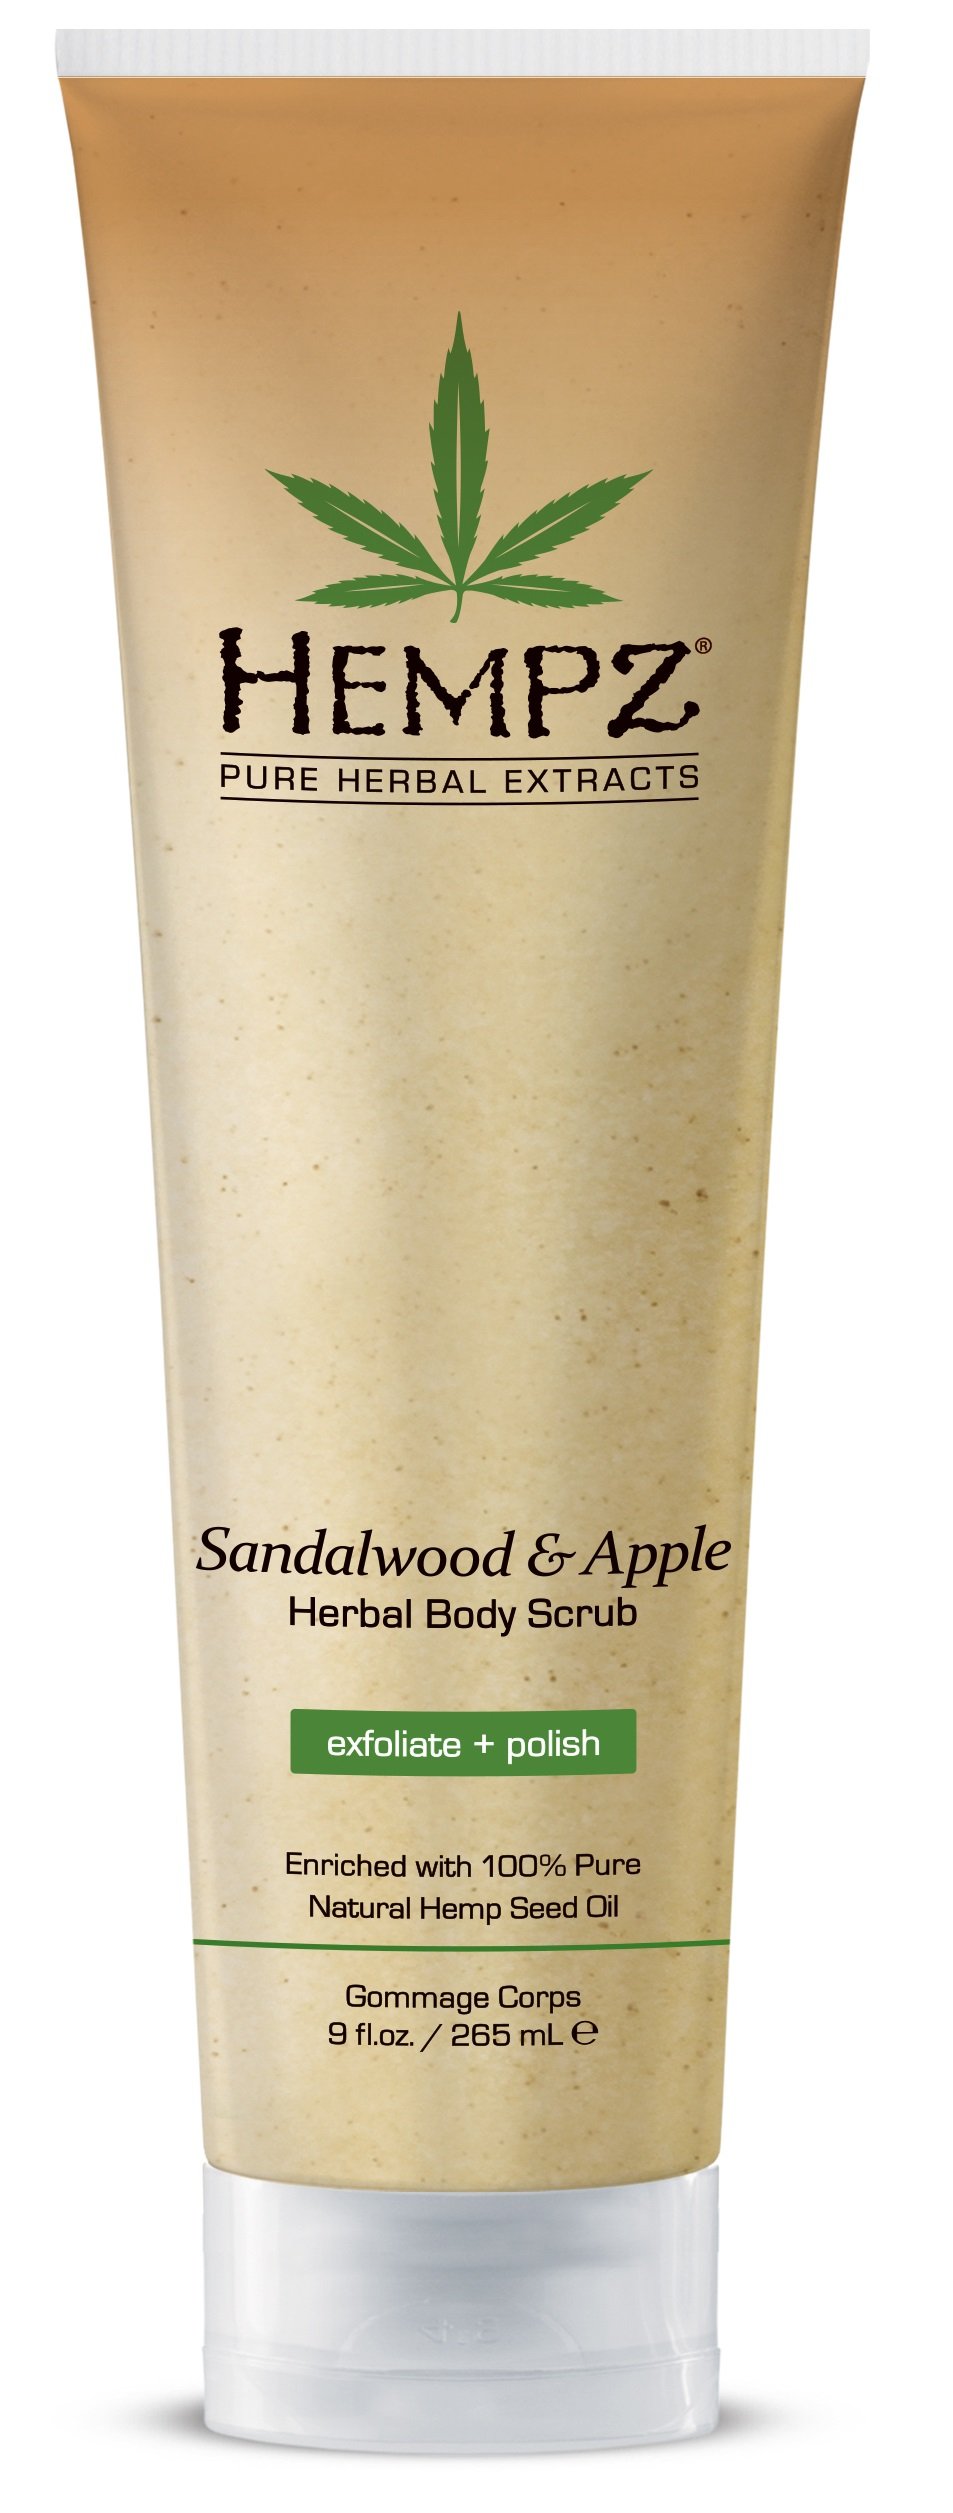 Image of Hempz Sandalwood & Apple Herbal Body Scrub 265ml